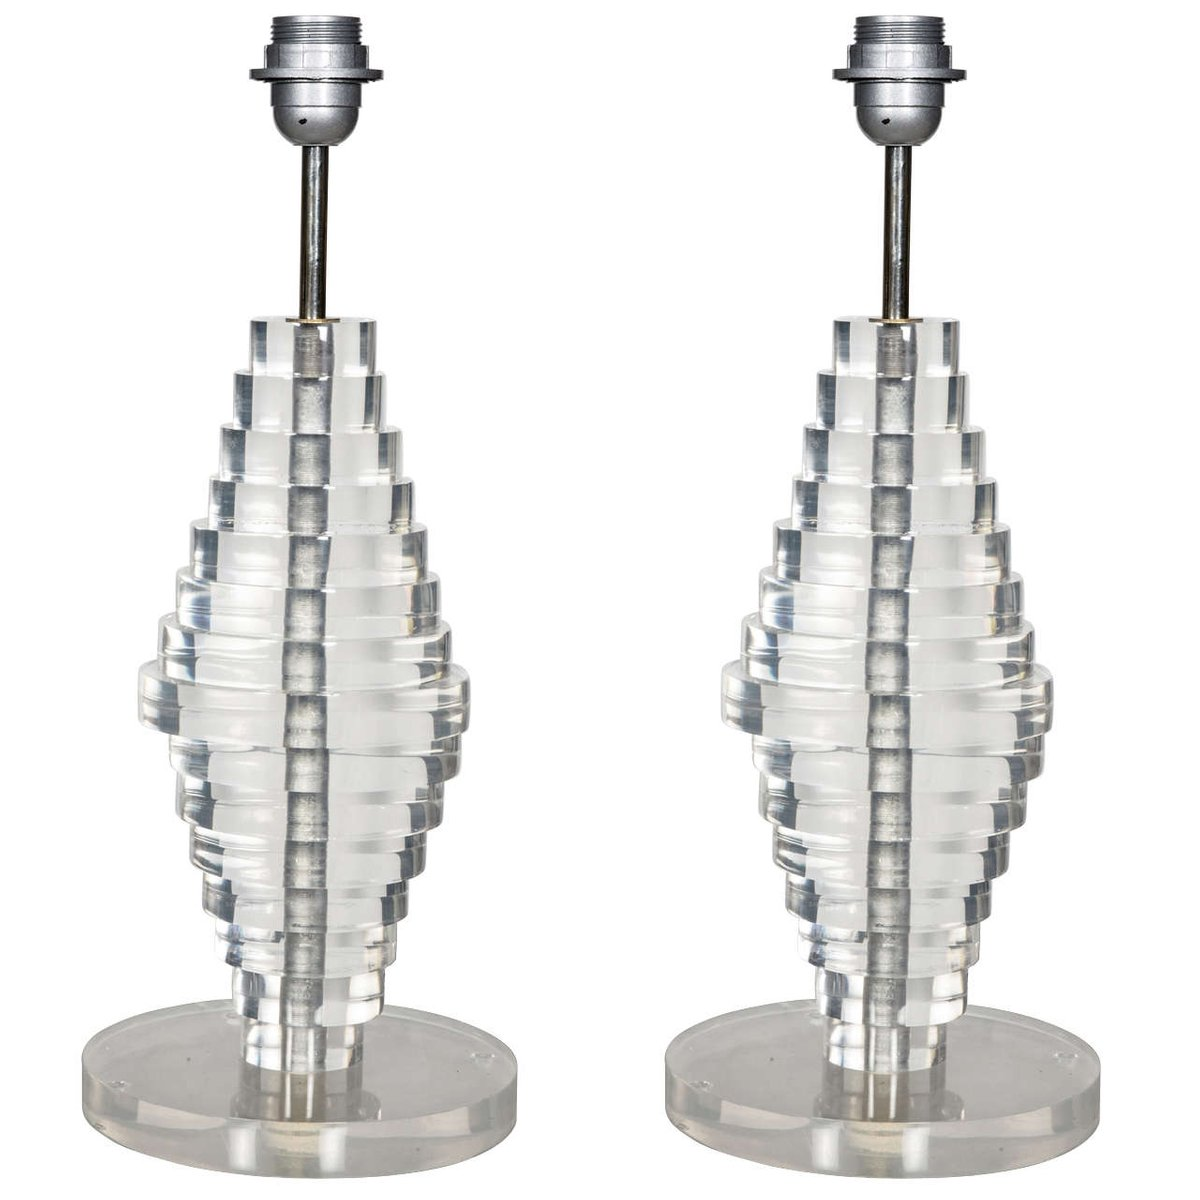 Vintage Lampen aus Plexiglas, 2er Set